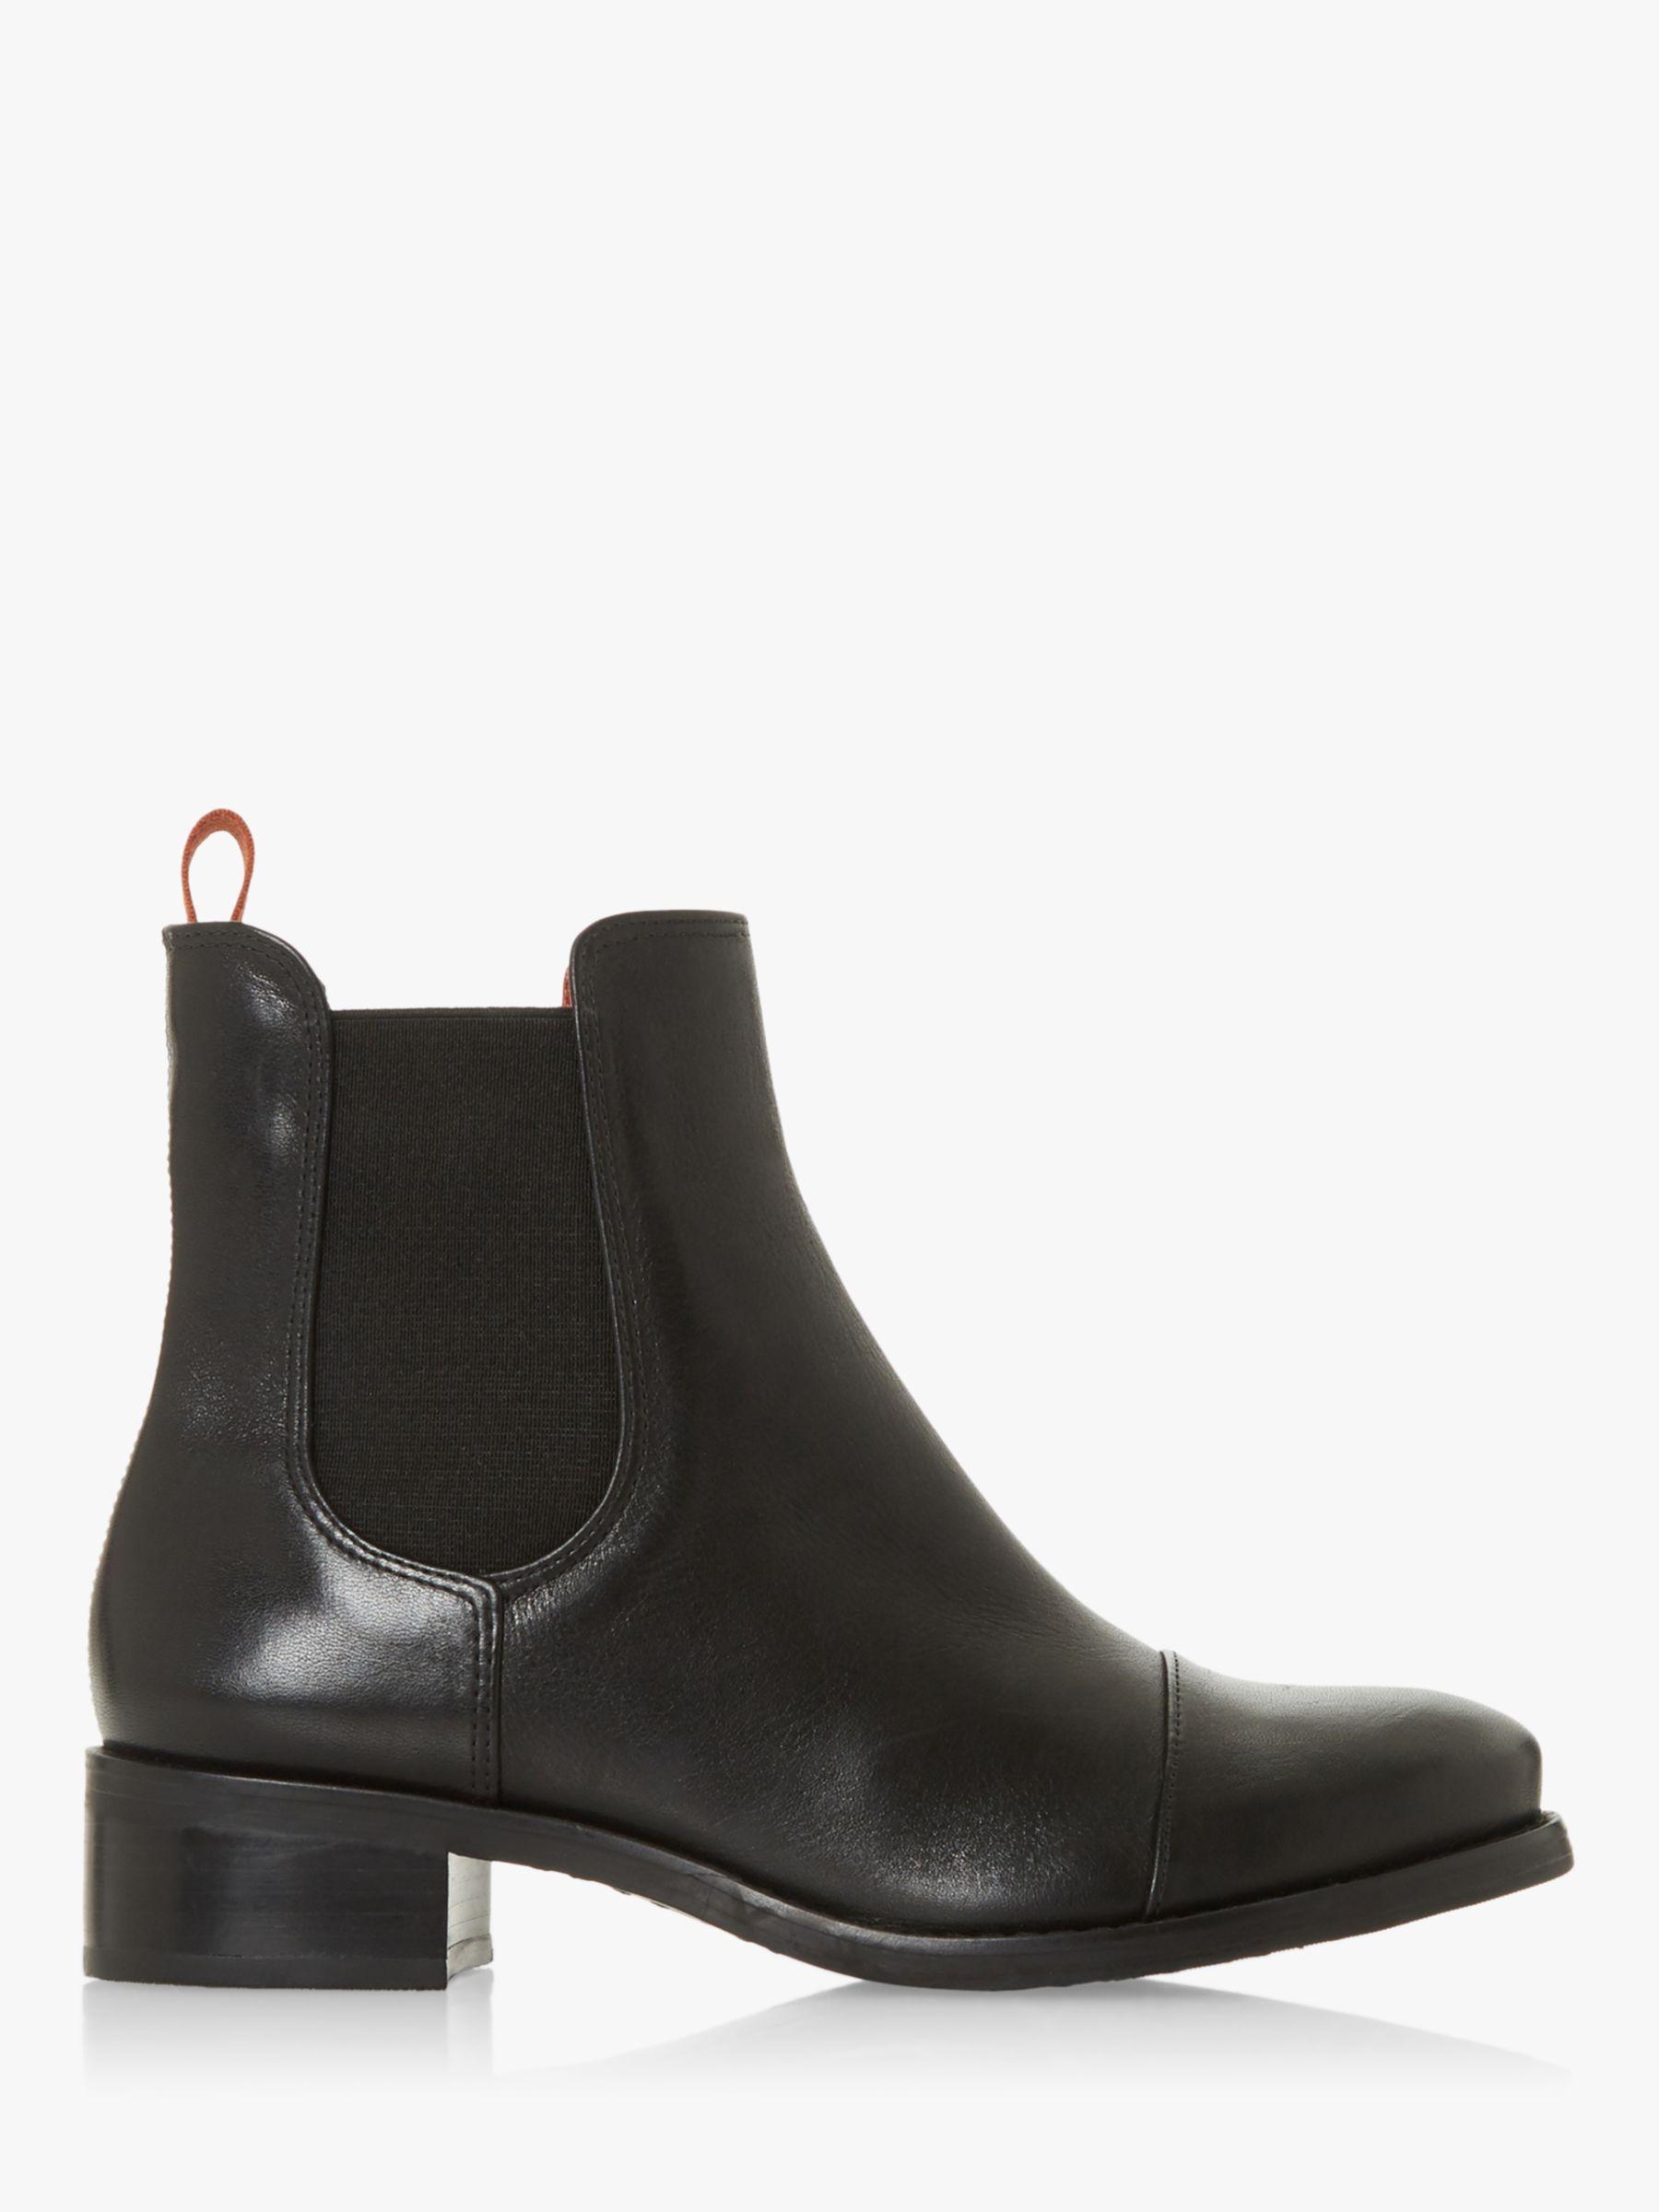 Bertie Bertie Pack Leather Block Heeled Ankle Boots, Black